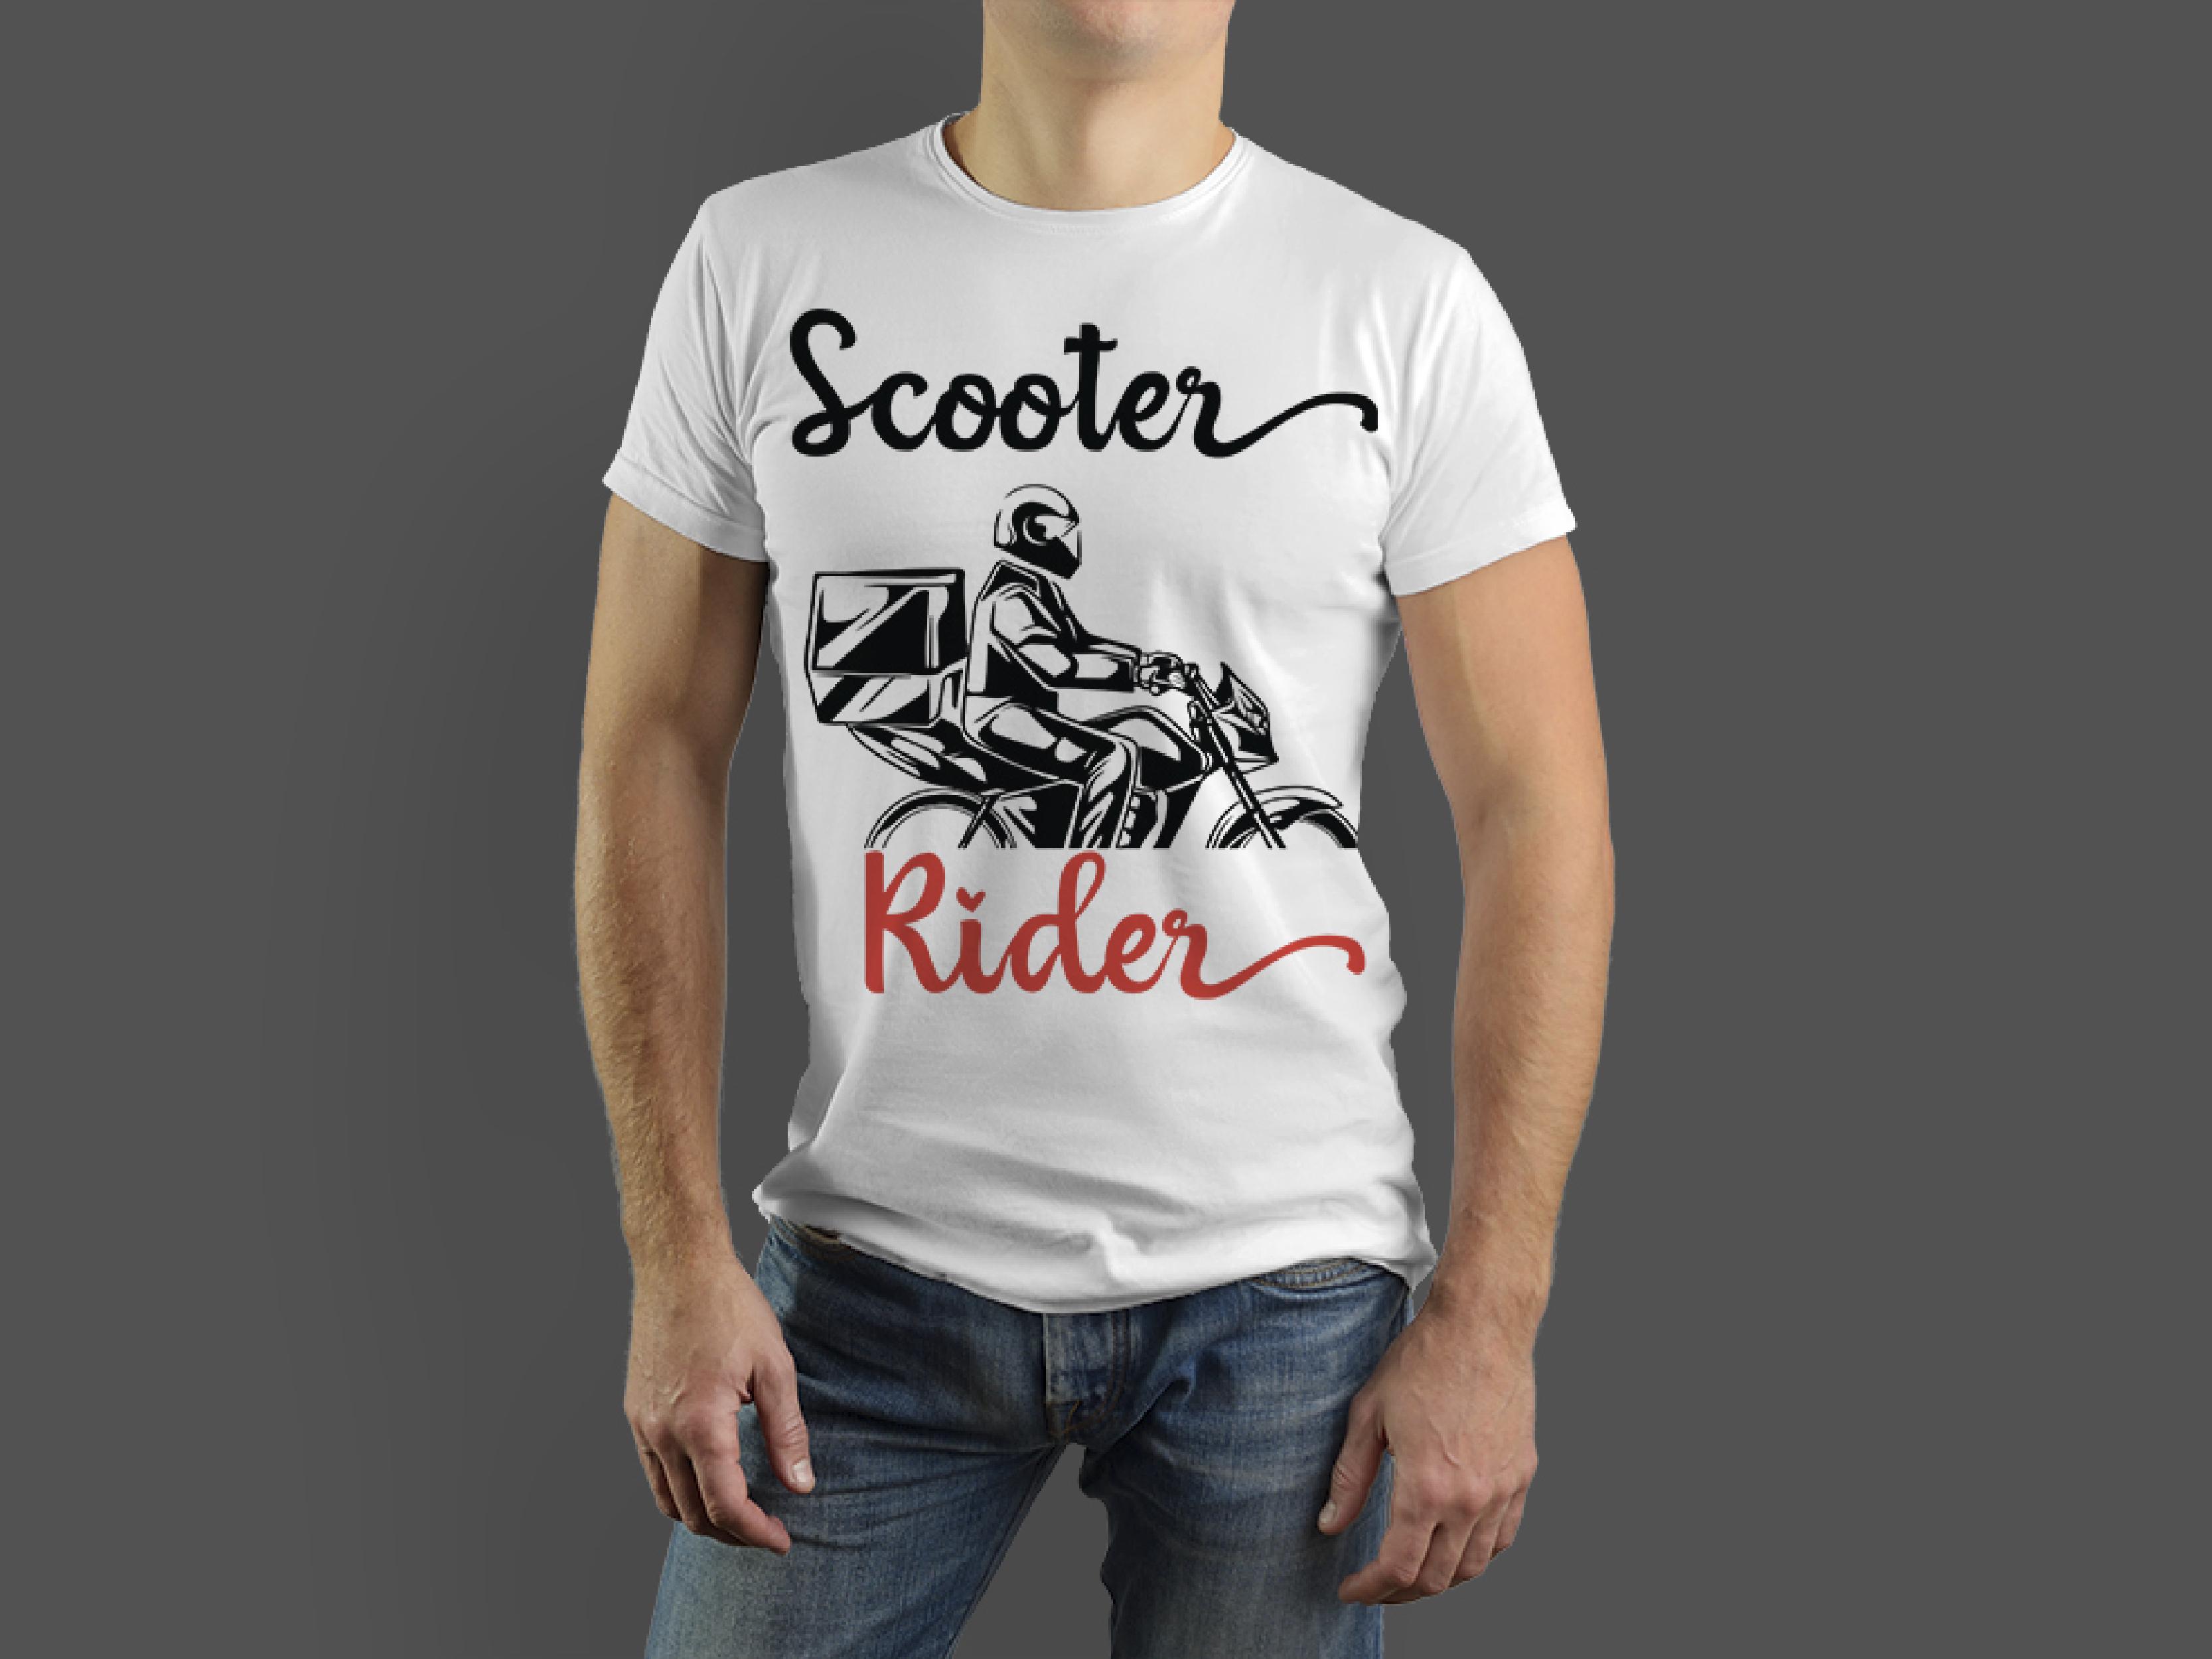 I Will Design a unique & Creative Typography T-shirt